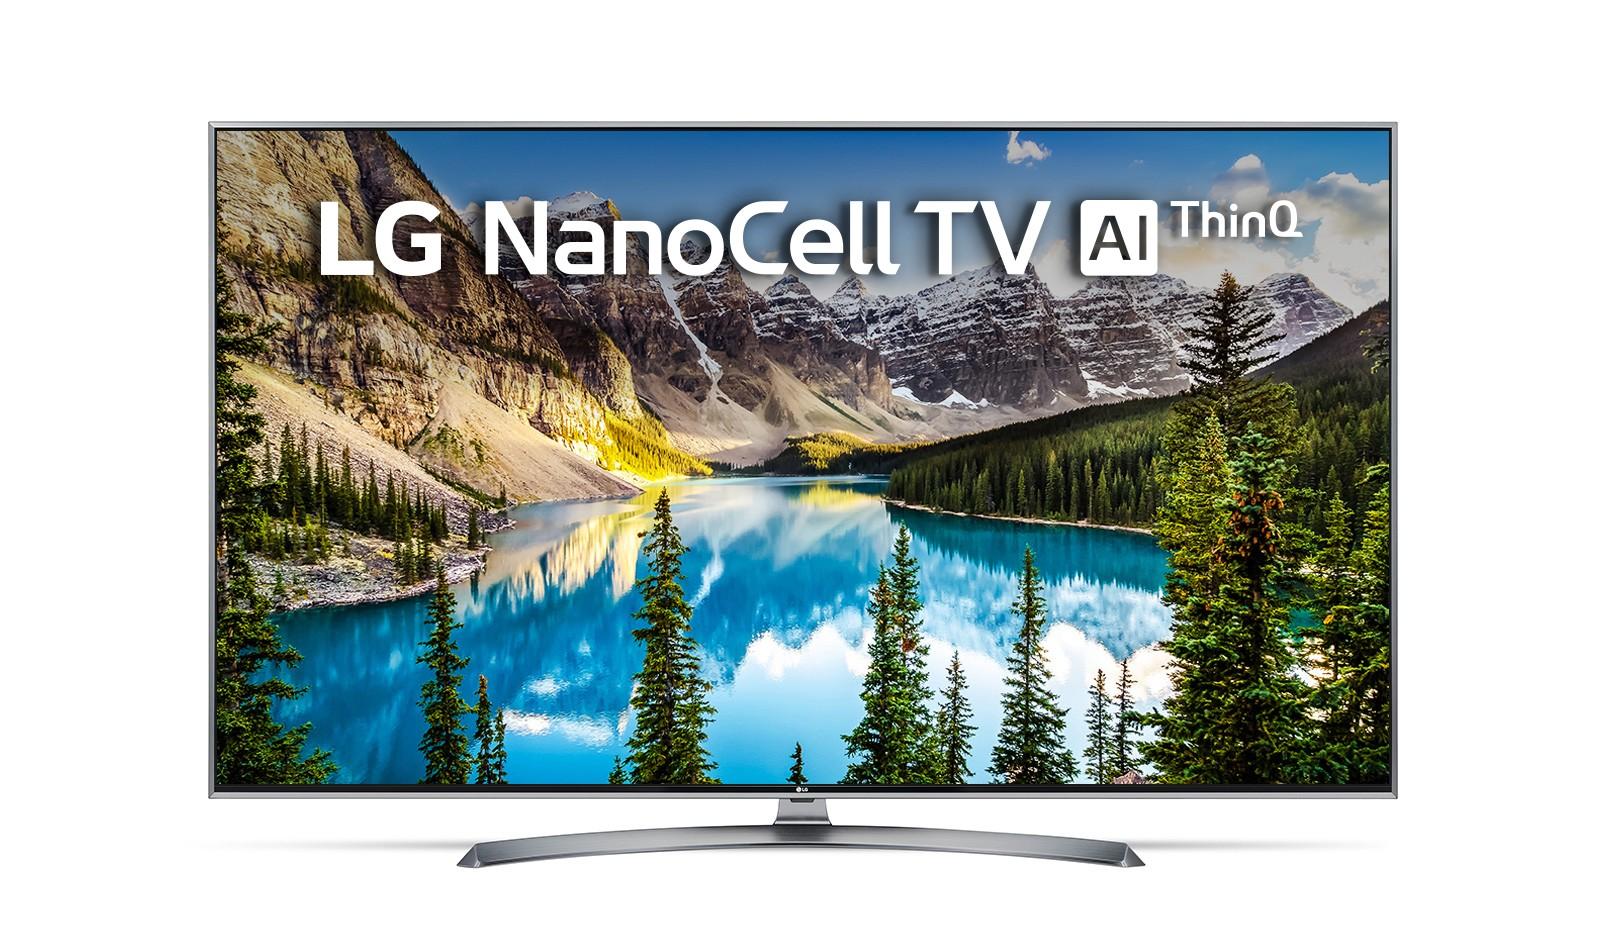 цена на Телевизор LG 43UJ750V LED 43 Titanium, Smart TV, 16:9, 3840x2160, USB, HDMI, AV, Wi-Fi, RJ-45, DVB-T2, C, S2